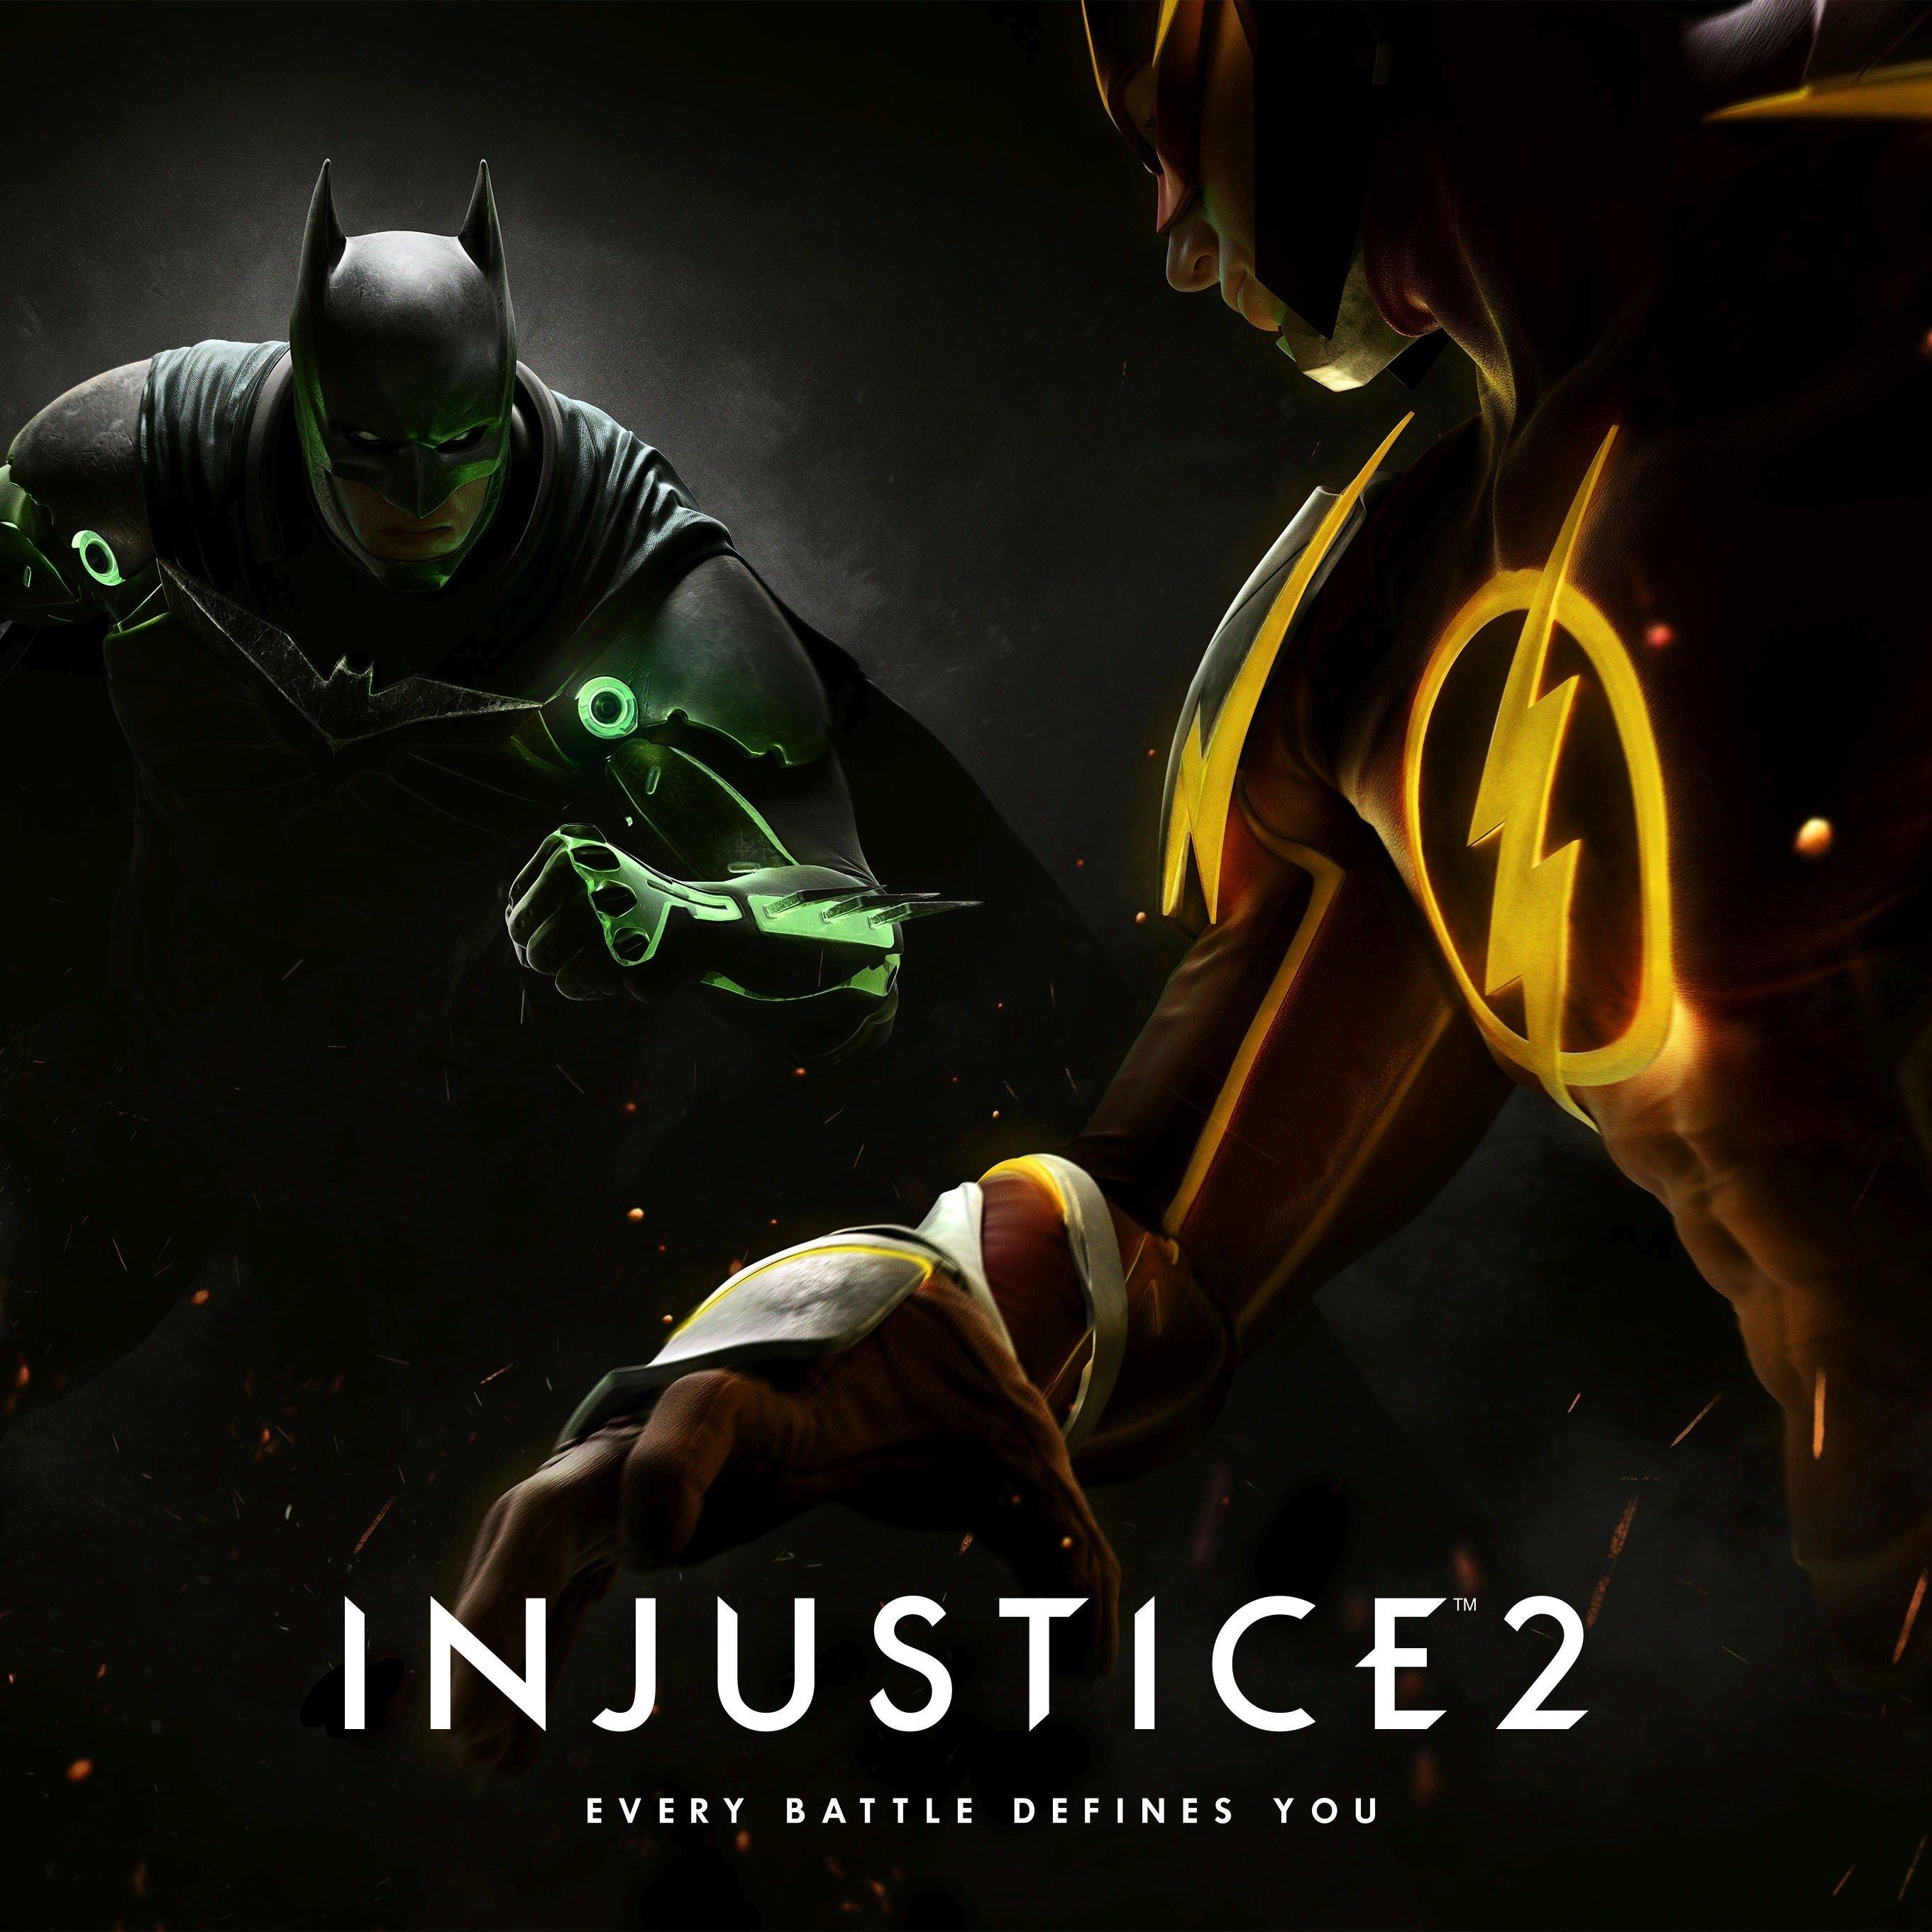 YA Game Days: Injustice 2 & Mortal Kombat Tournament